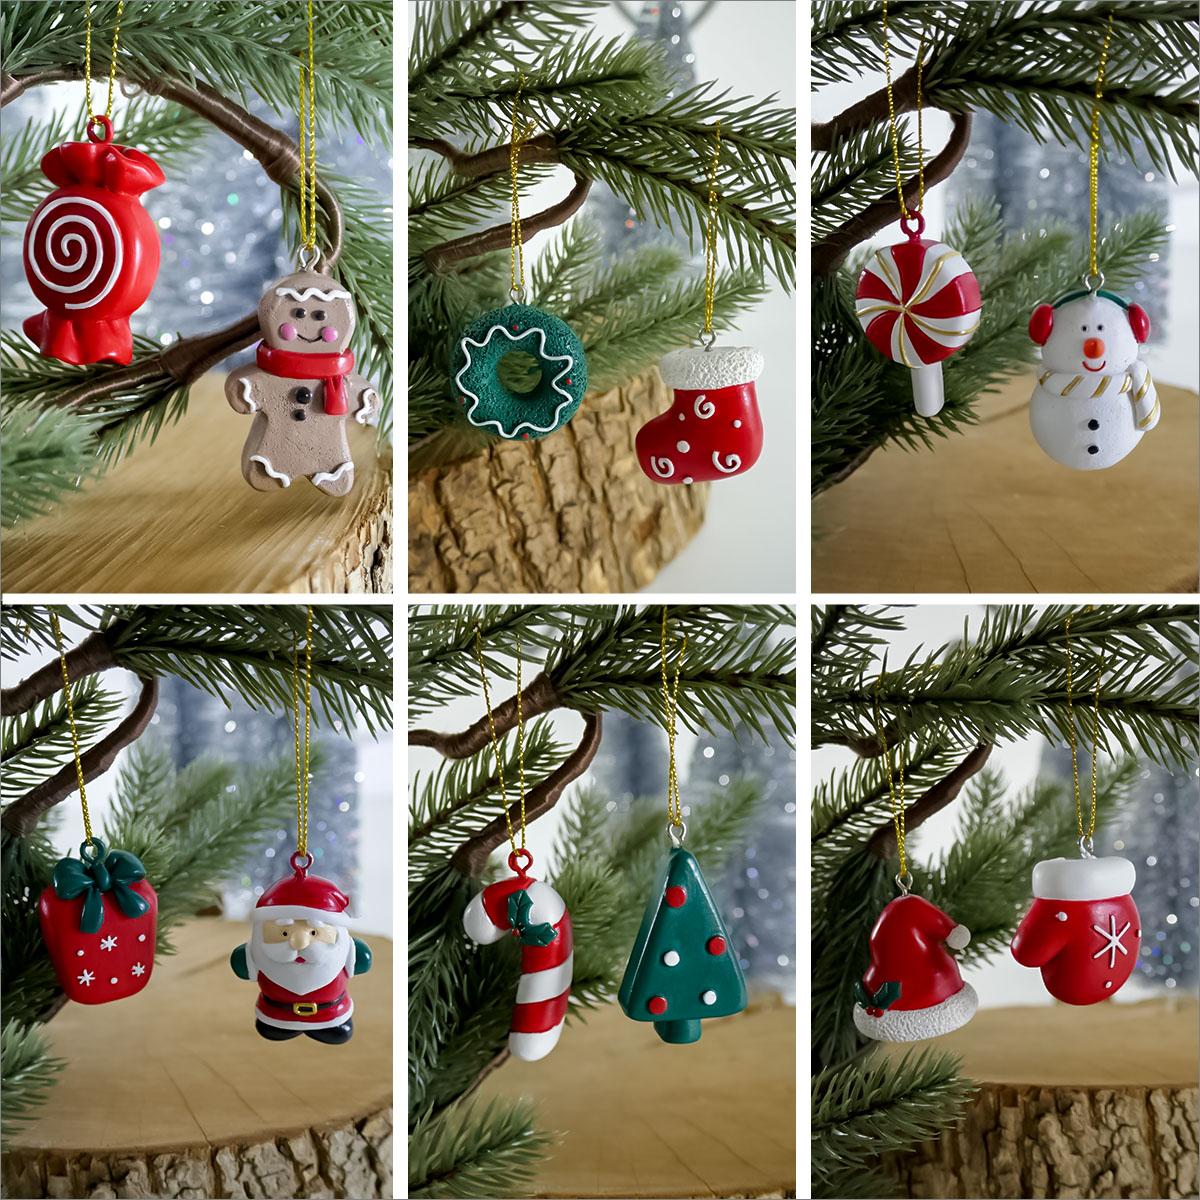 6er Set Christbaum-Weihnachtsaufhänger Image